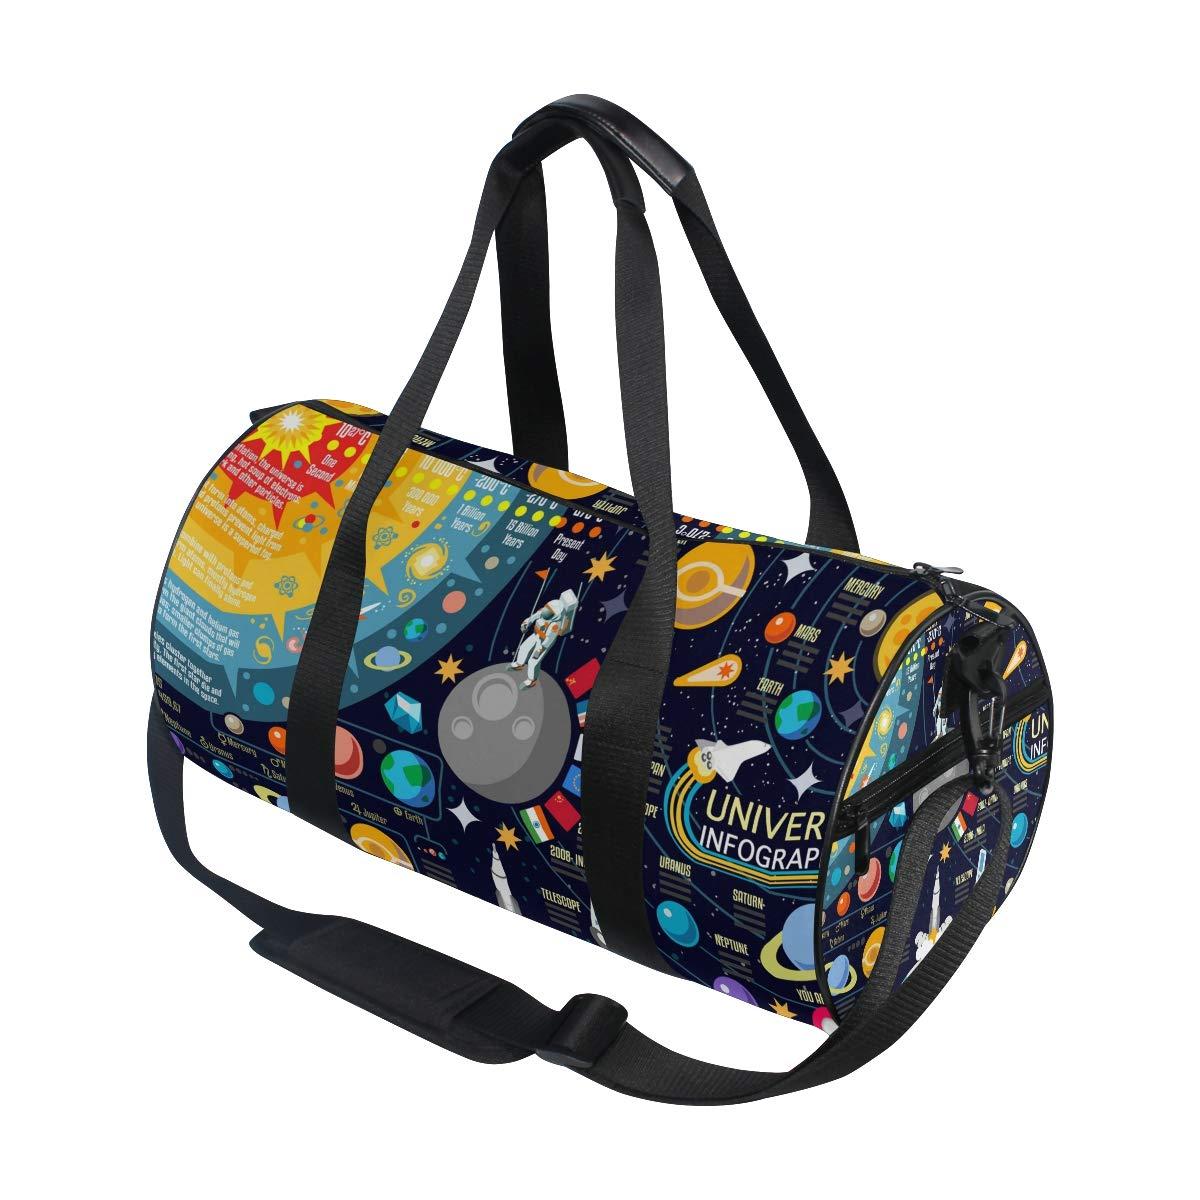 WIHVE Gym Duffel Bag Universe Moon Space Milky Way Sports Lightweight Canvas Travel Luggage Bag